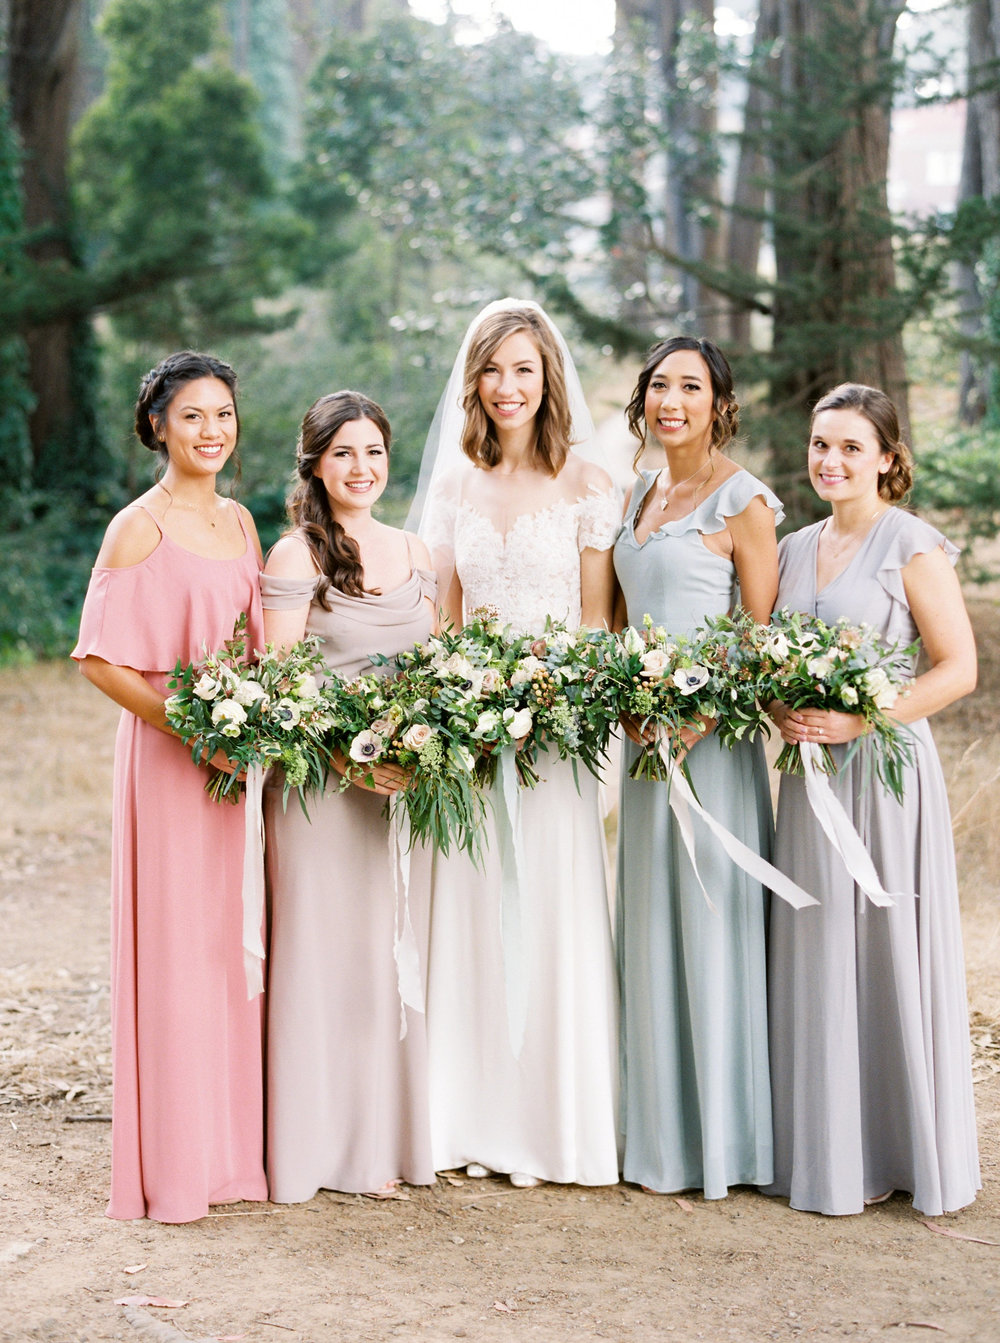 Log-cabin-wedding-in-presidio-san-francisco-california-desintation-wedding-photography-63.jpg